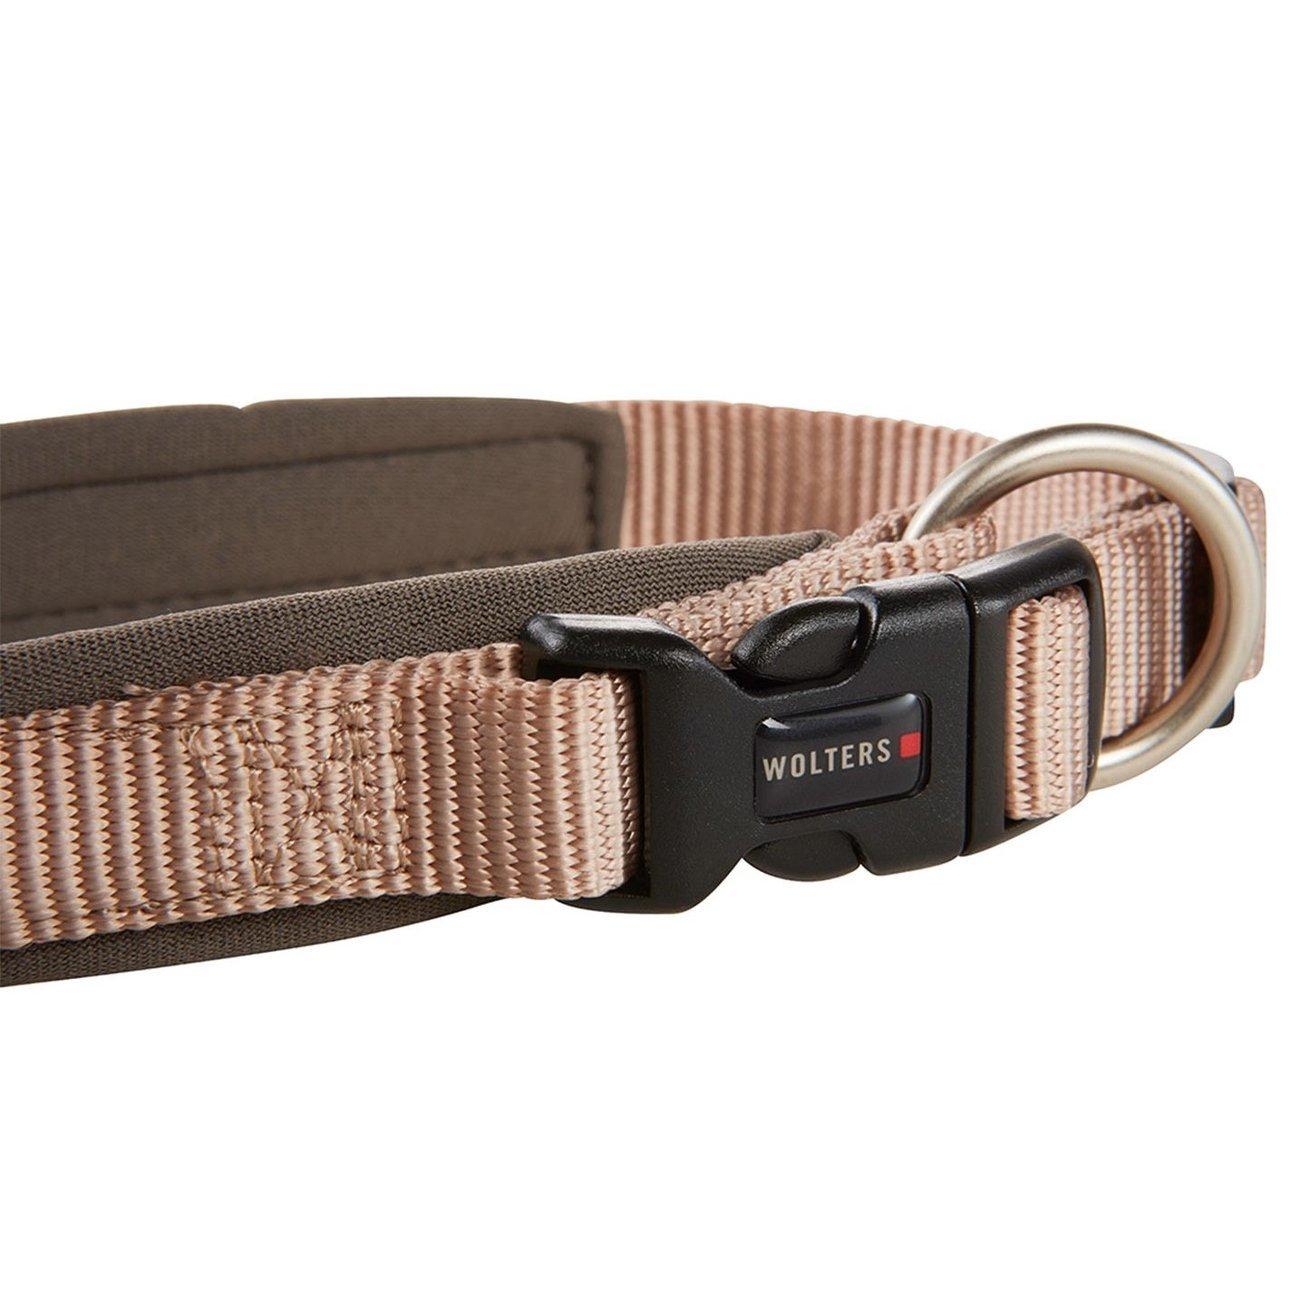 Wolters Halsband Professional Comfort Extra breit, Bild 3